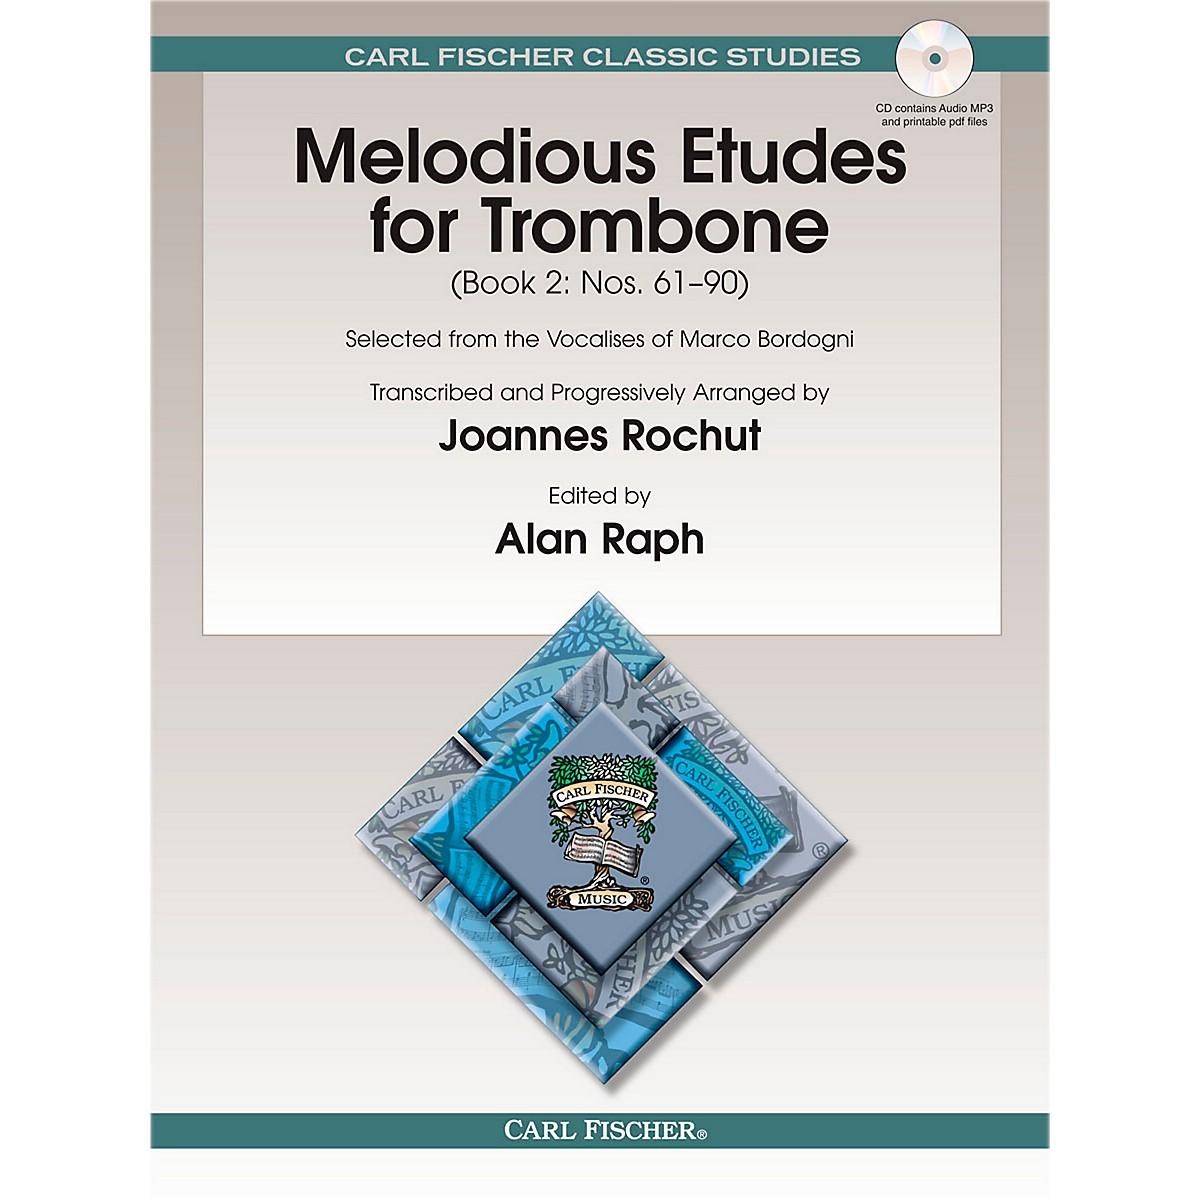 Carl Fischer Melodious Etudes for Trombone, Vol. 2